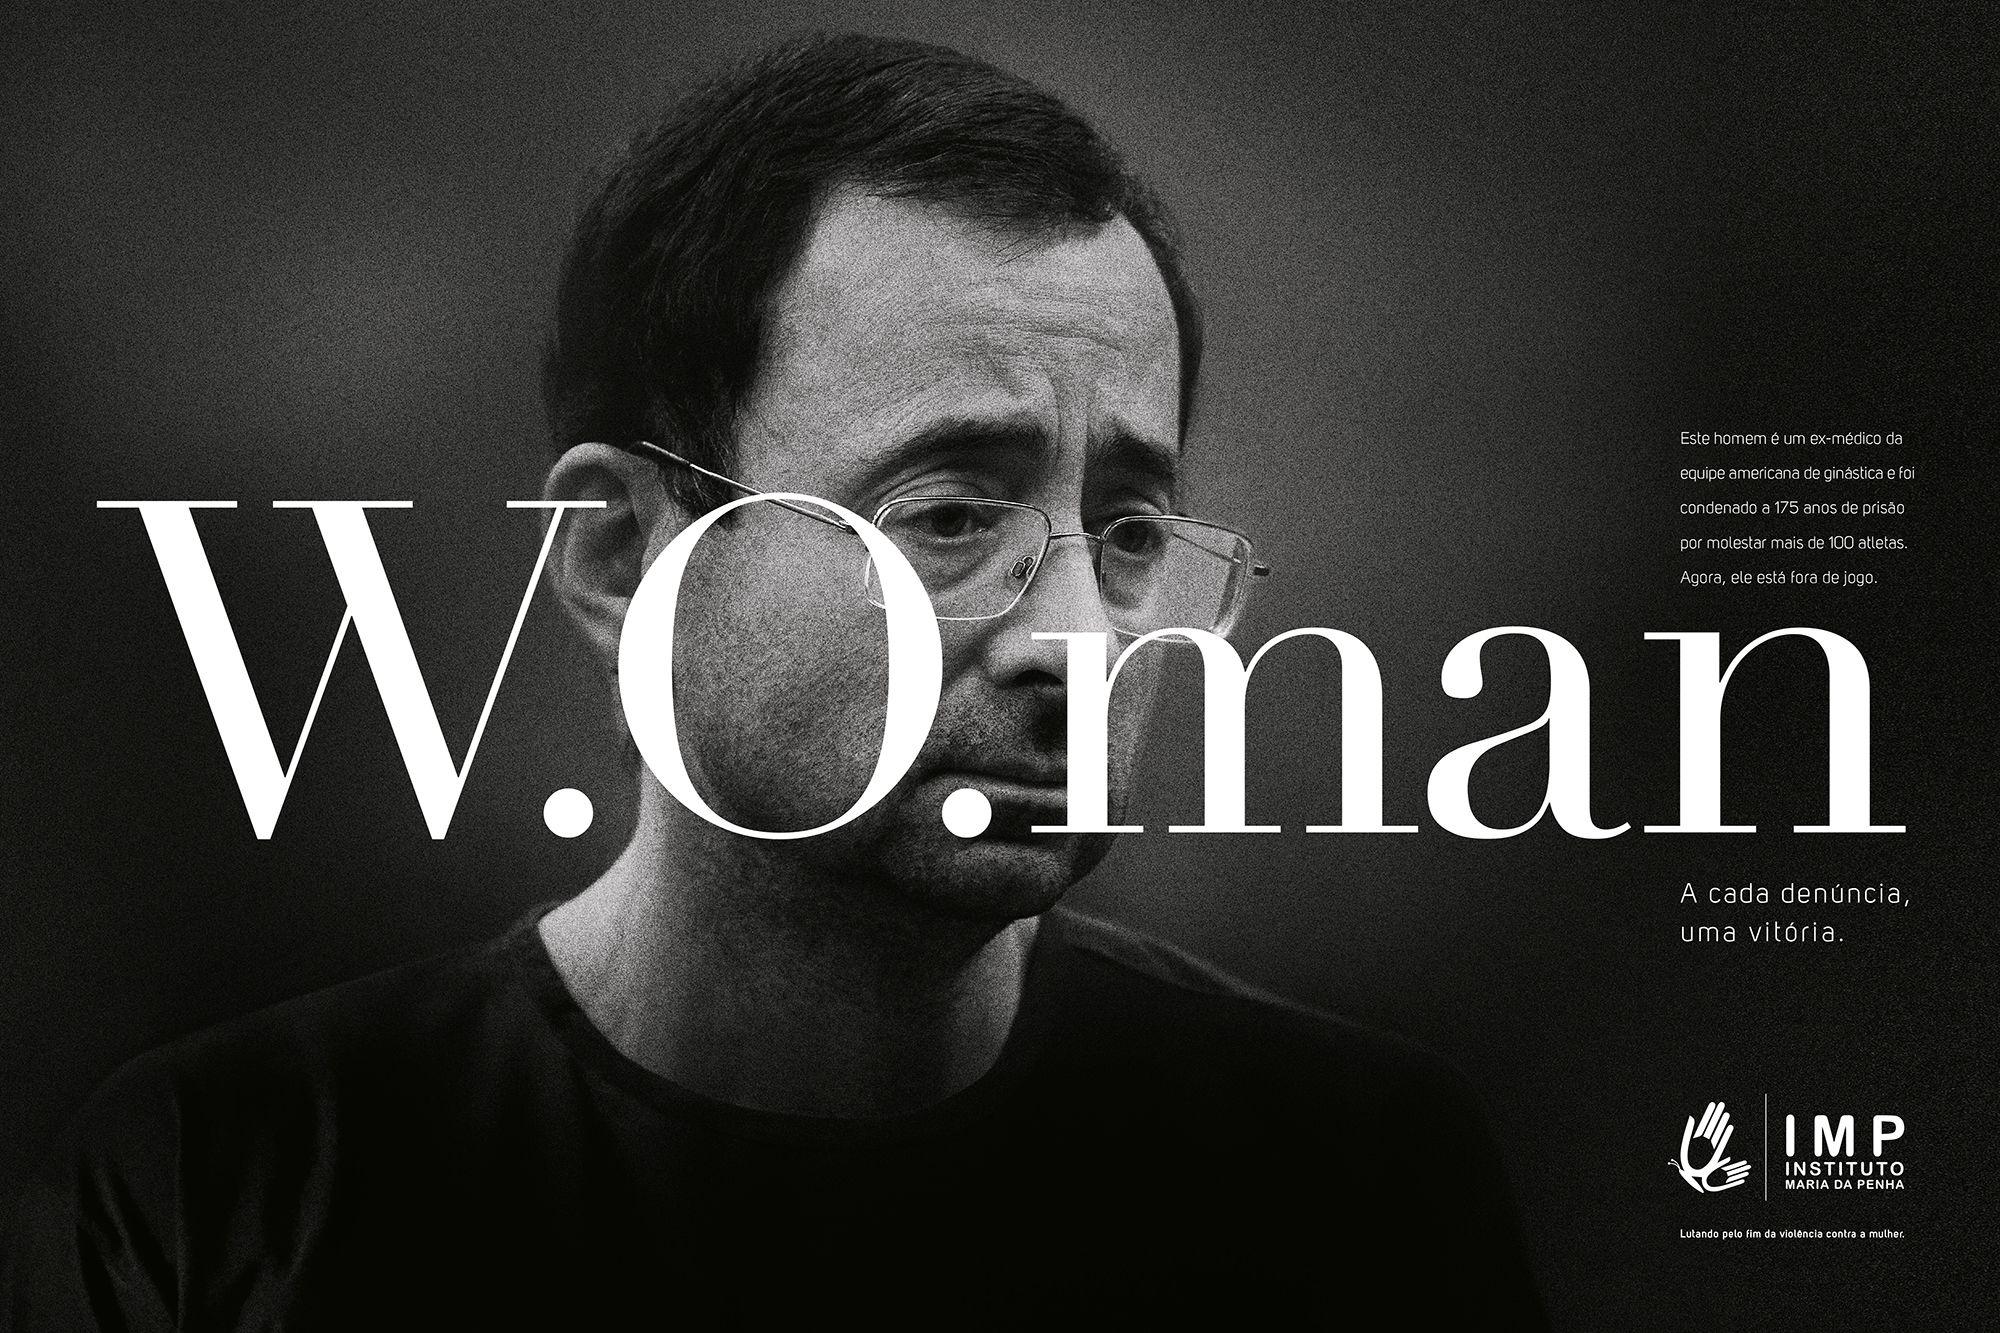 W.O.man - Médico